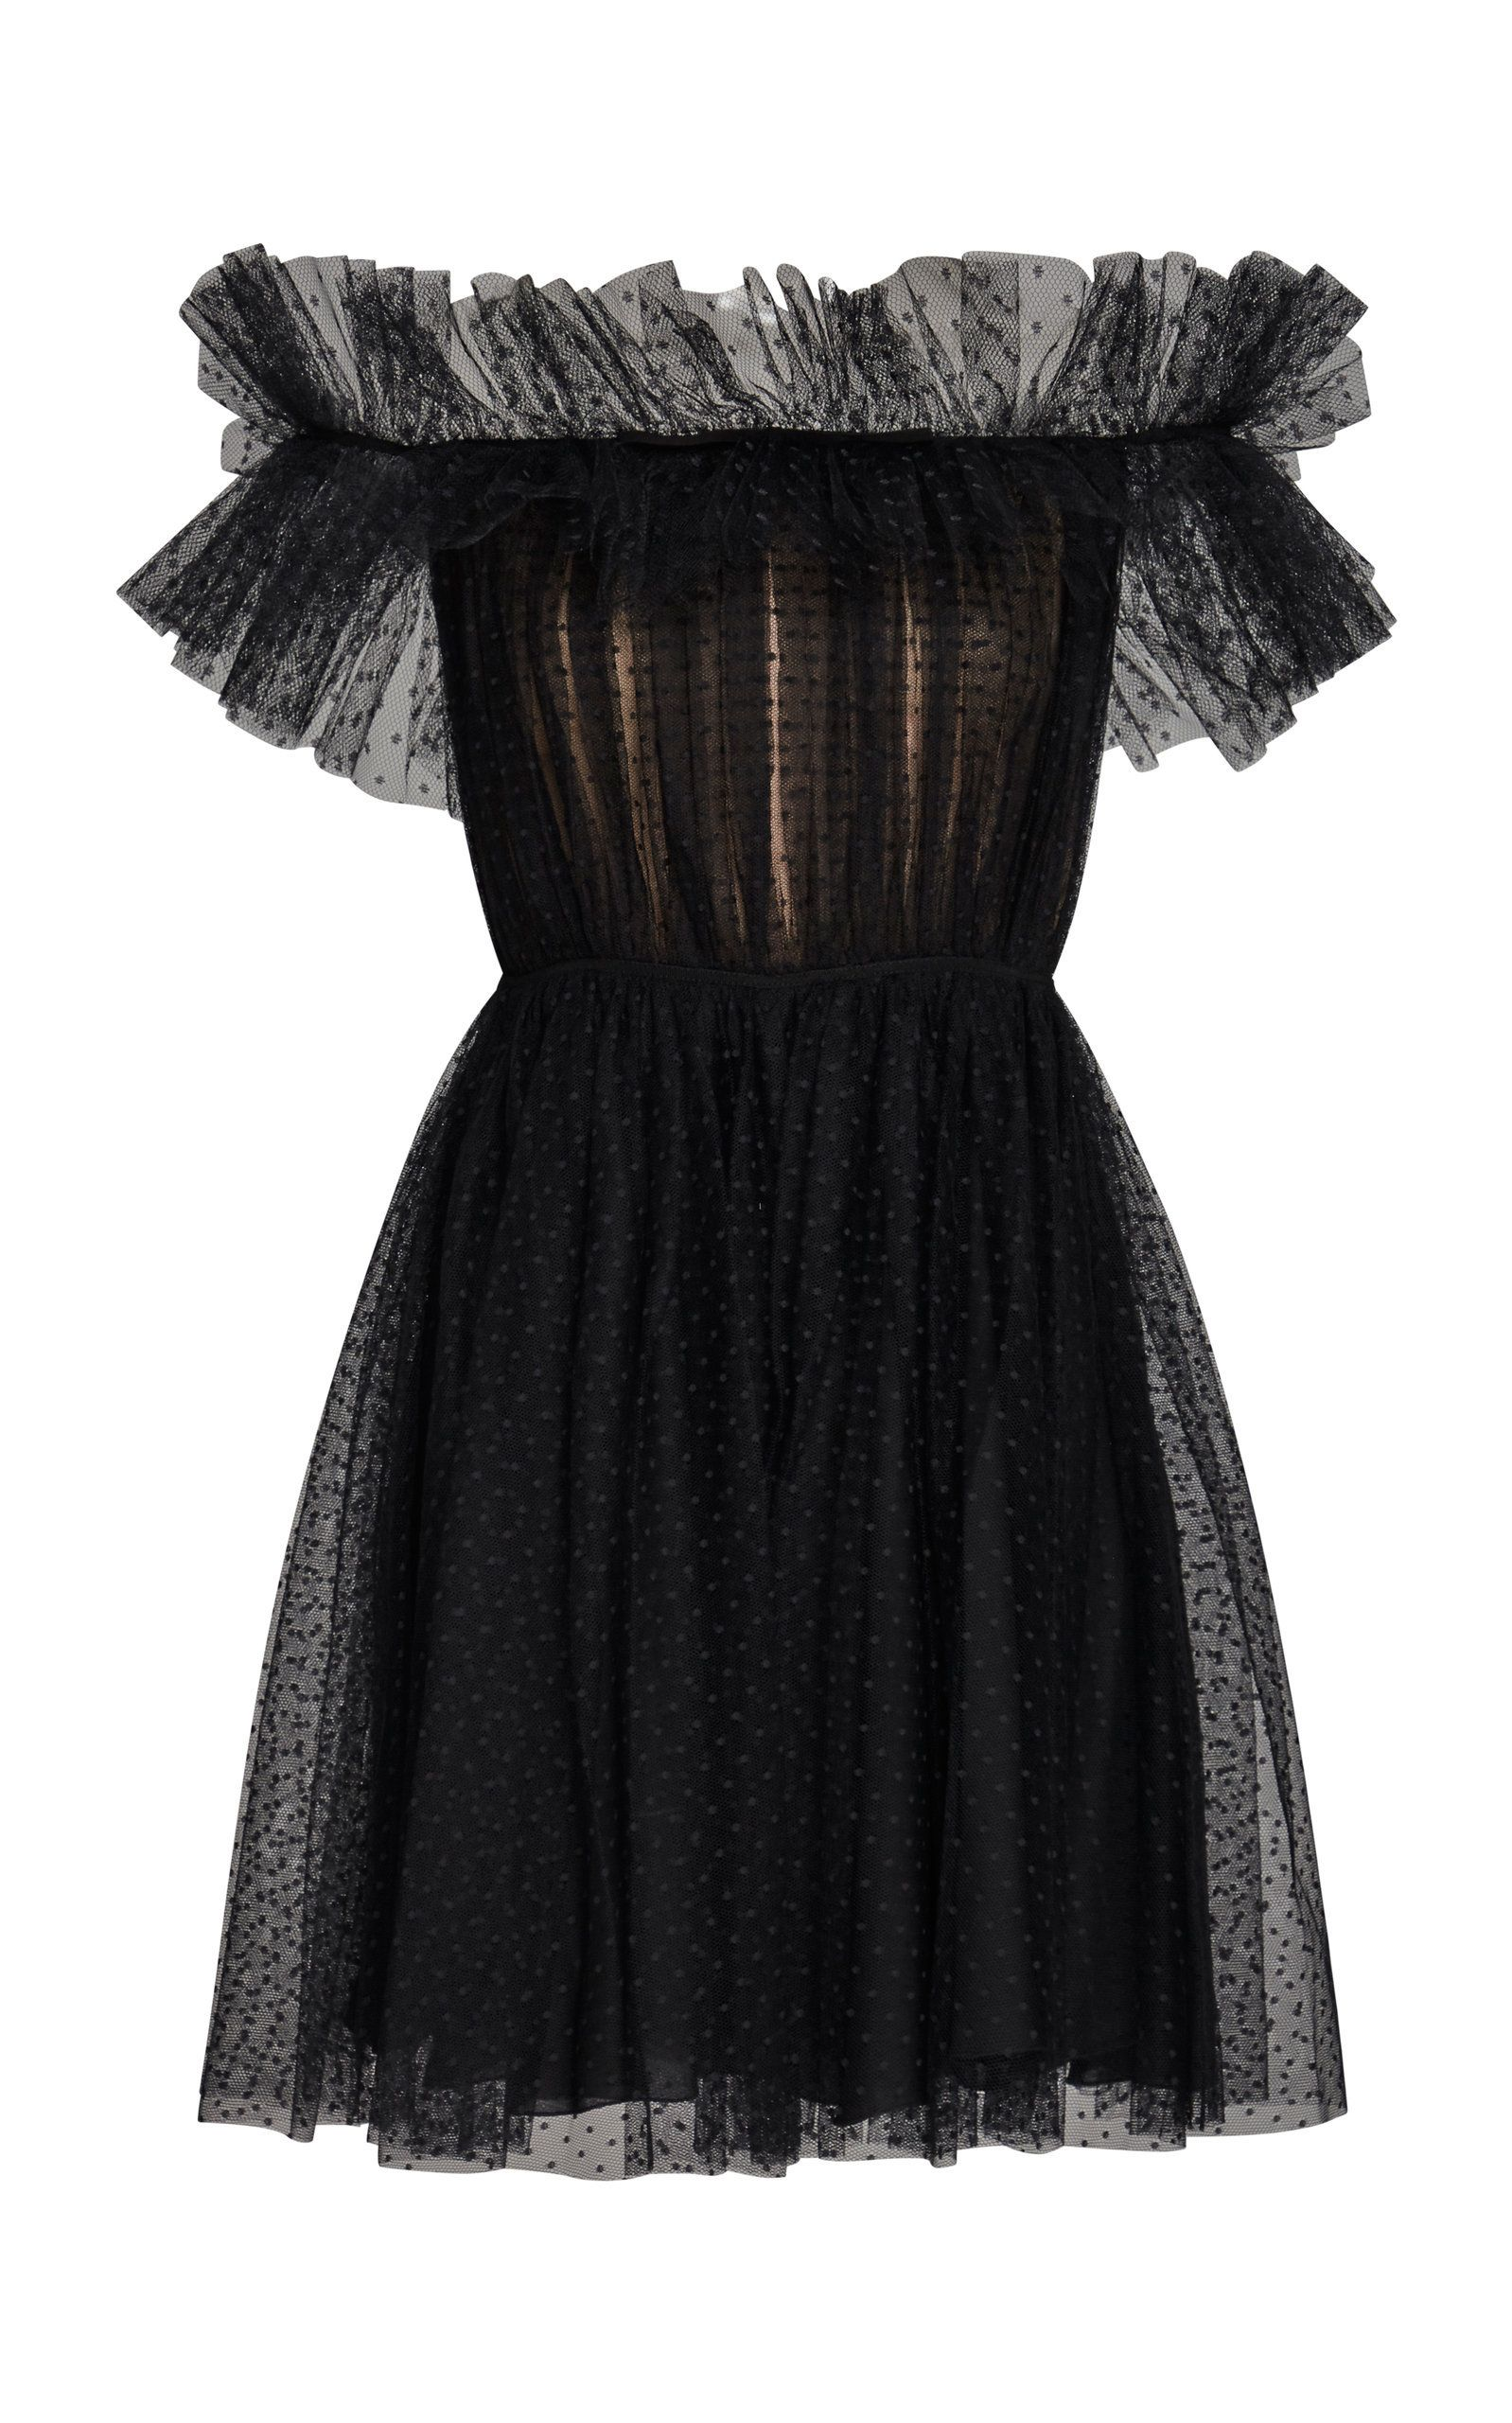 Giambattista Valli Shirred Tulle Mini Dress Fashion Fashion Outfits Fancy Dresses [ 2560 x 1598 Pixel ]